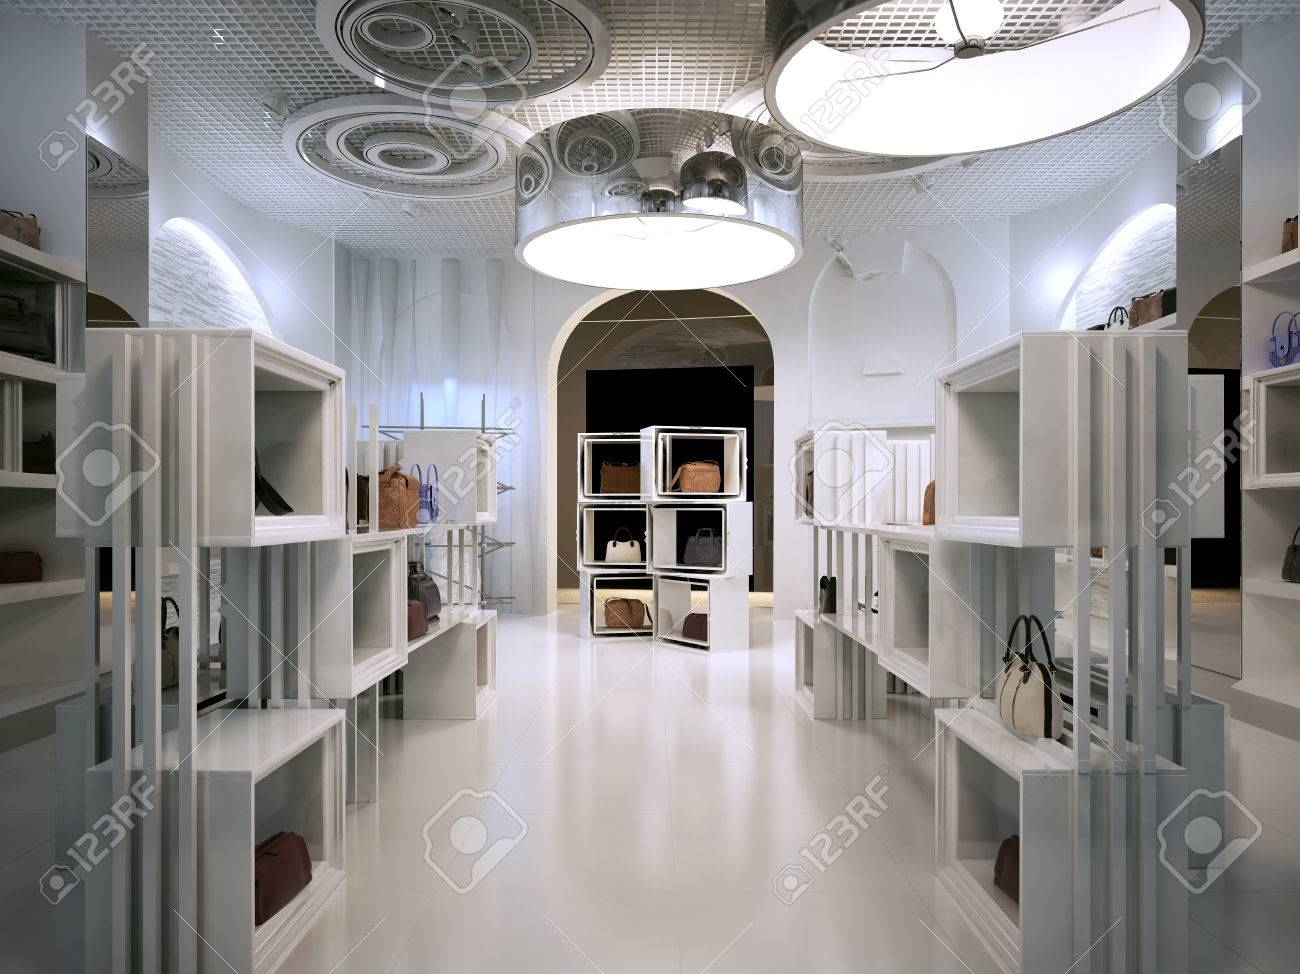 luxury store interior design art deco style with hints of  - luxury store interior design art deco style with hints of contemporaryinterior white store with